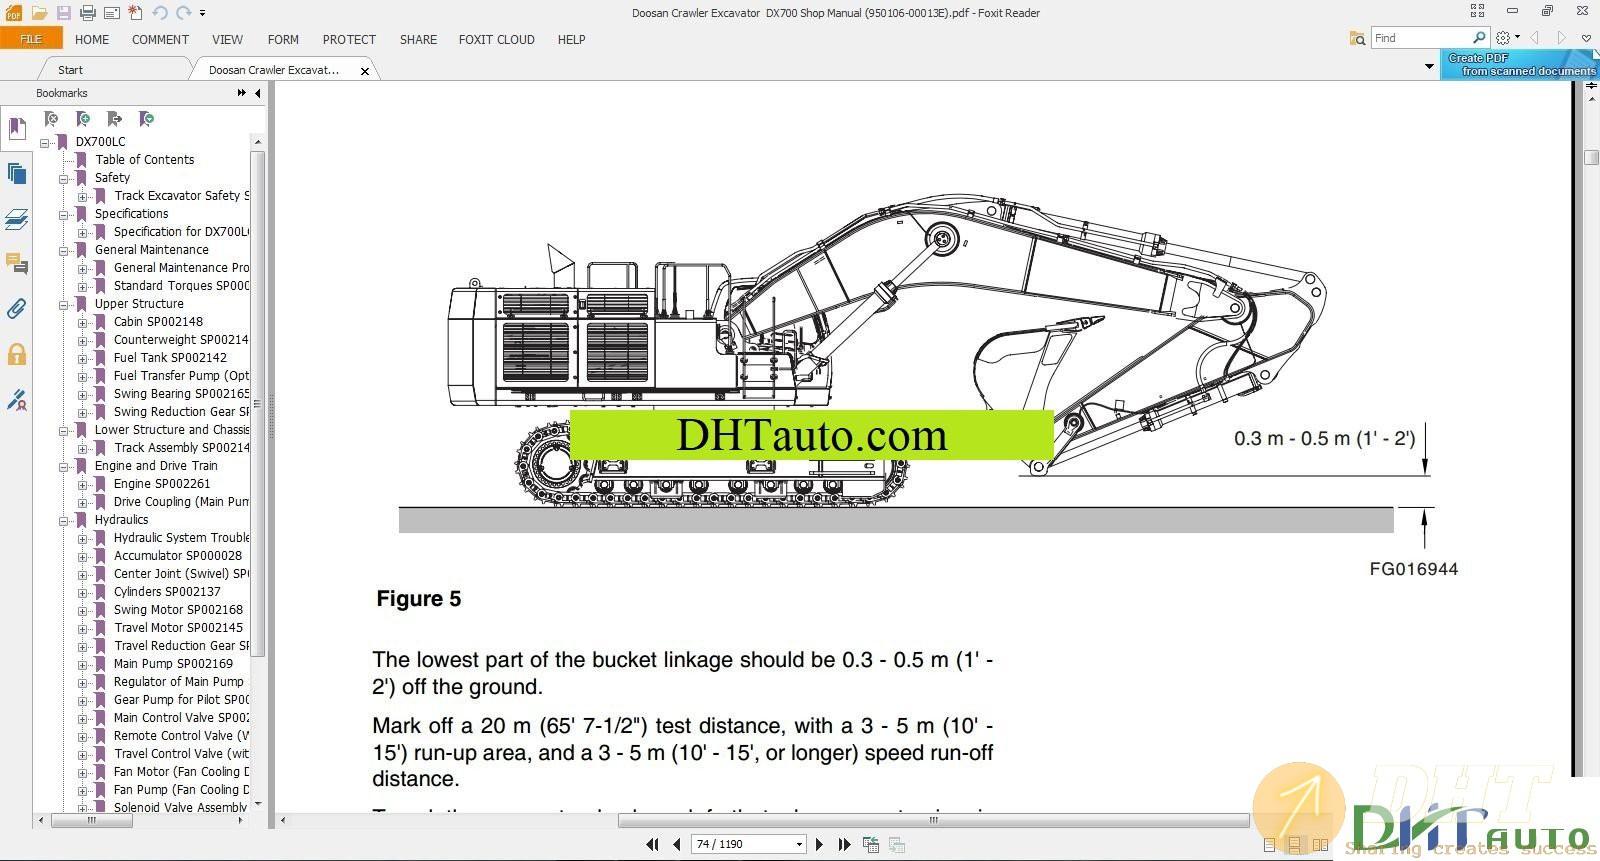 Doosan DX Workshop Manual Full 4.jpg